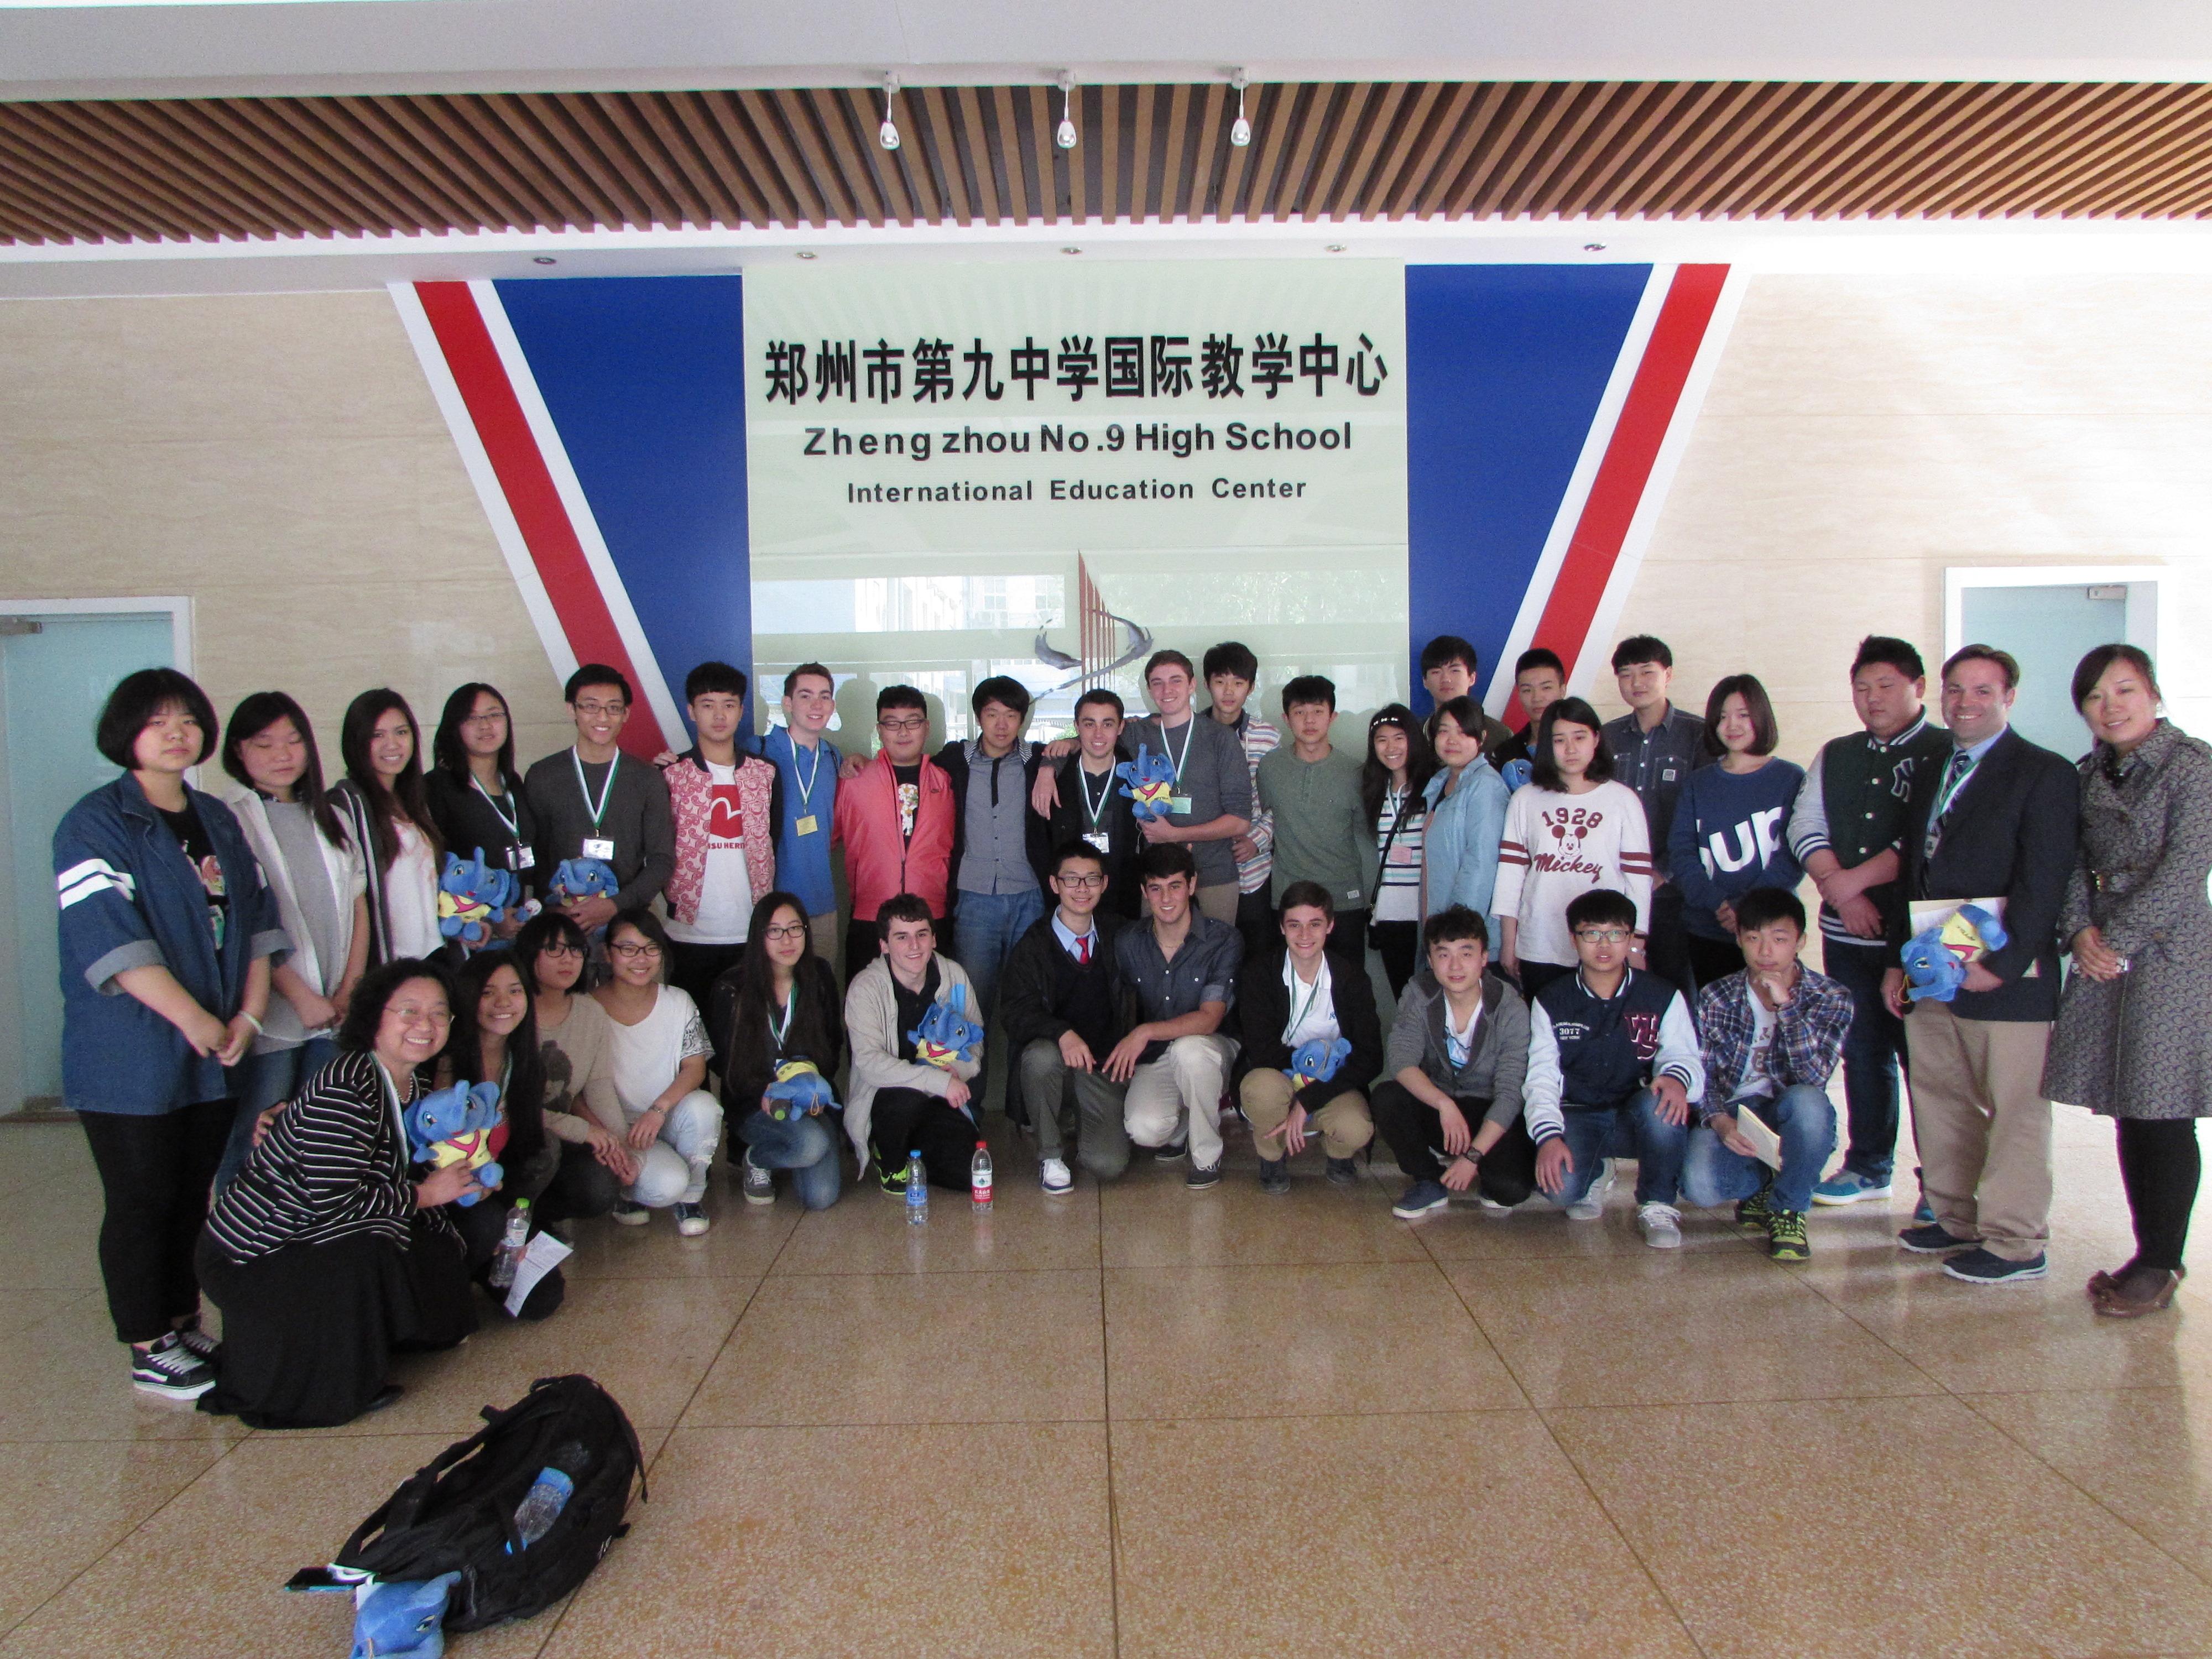 2957cfe72c7138ab9a03_China_Trip.JPG